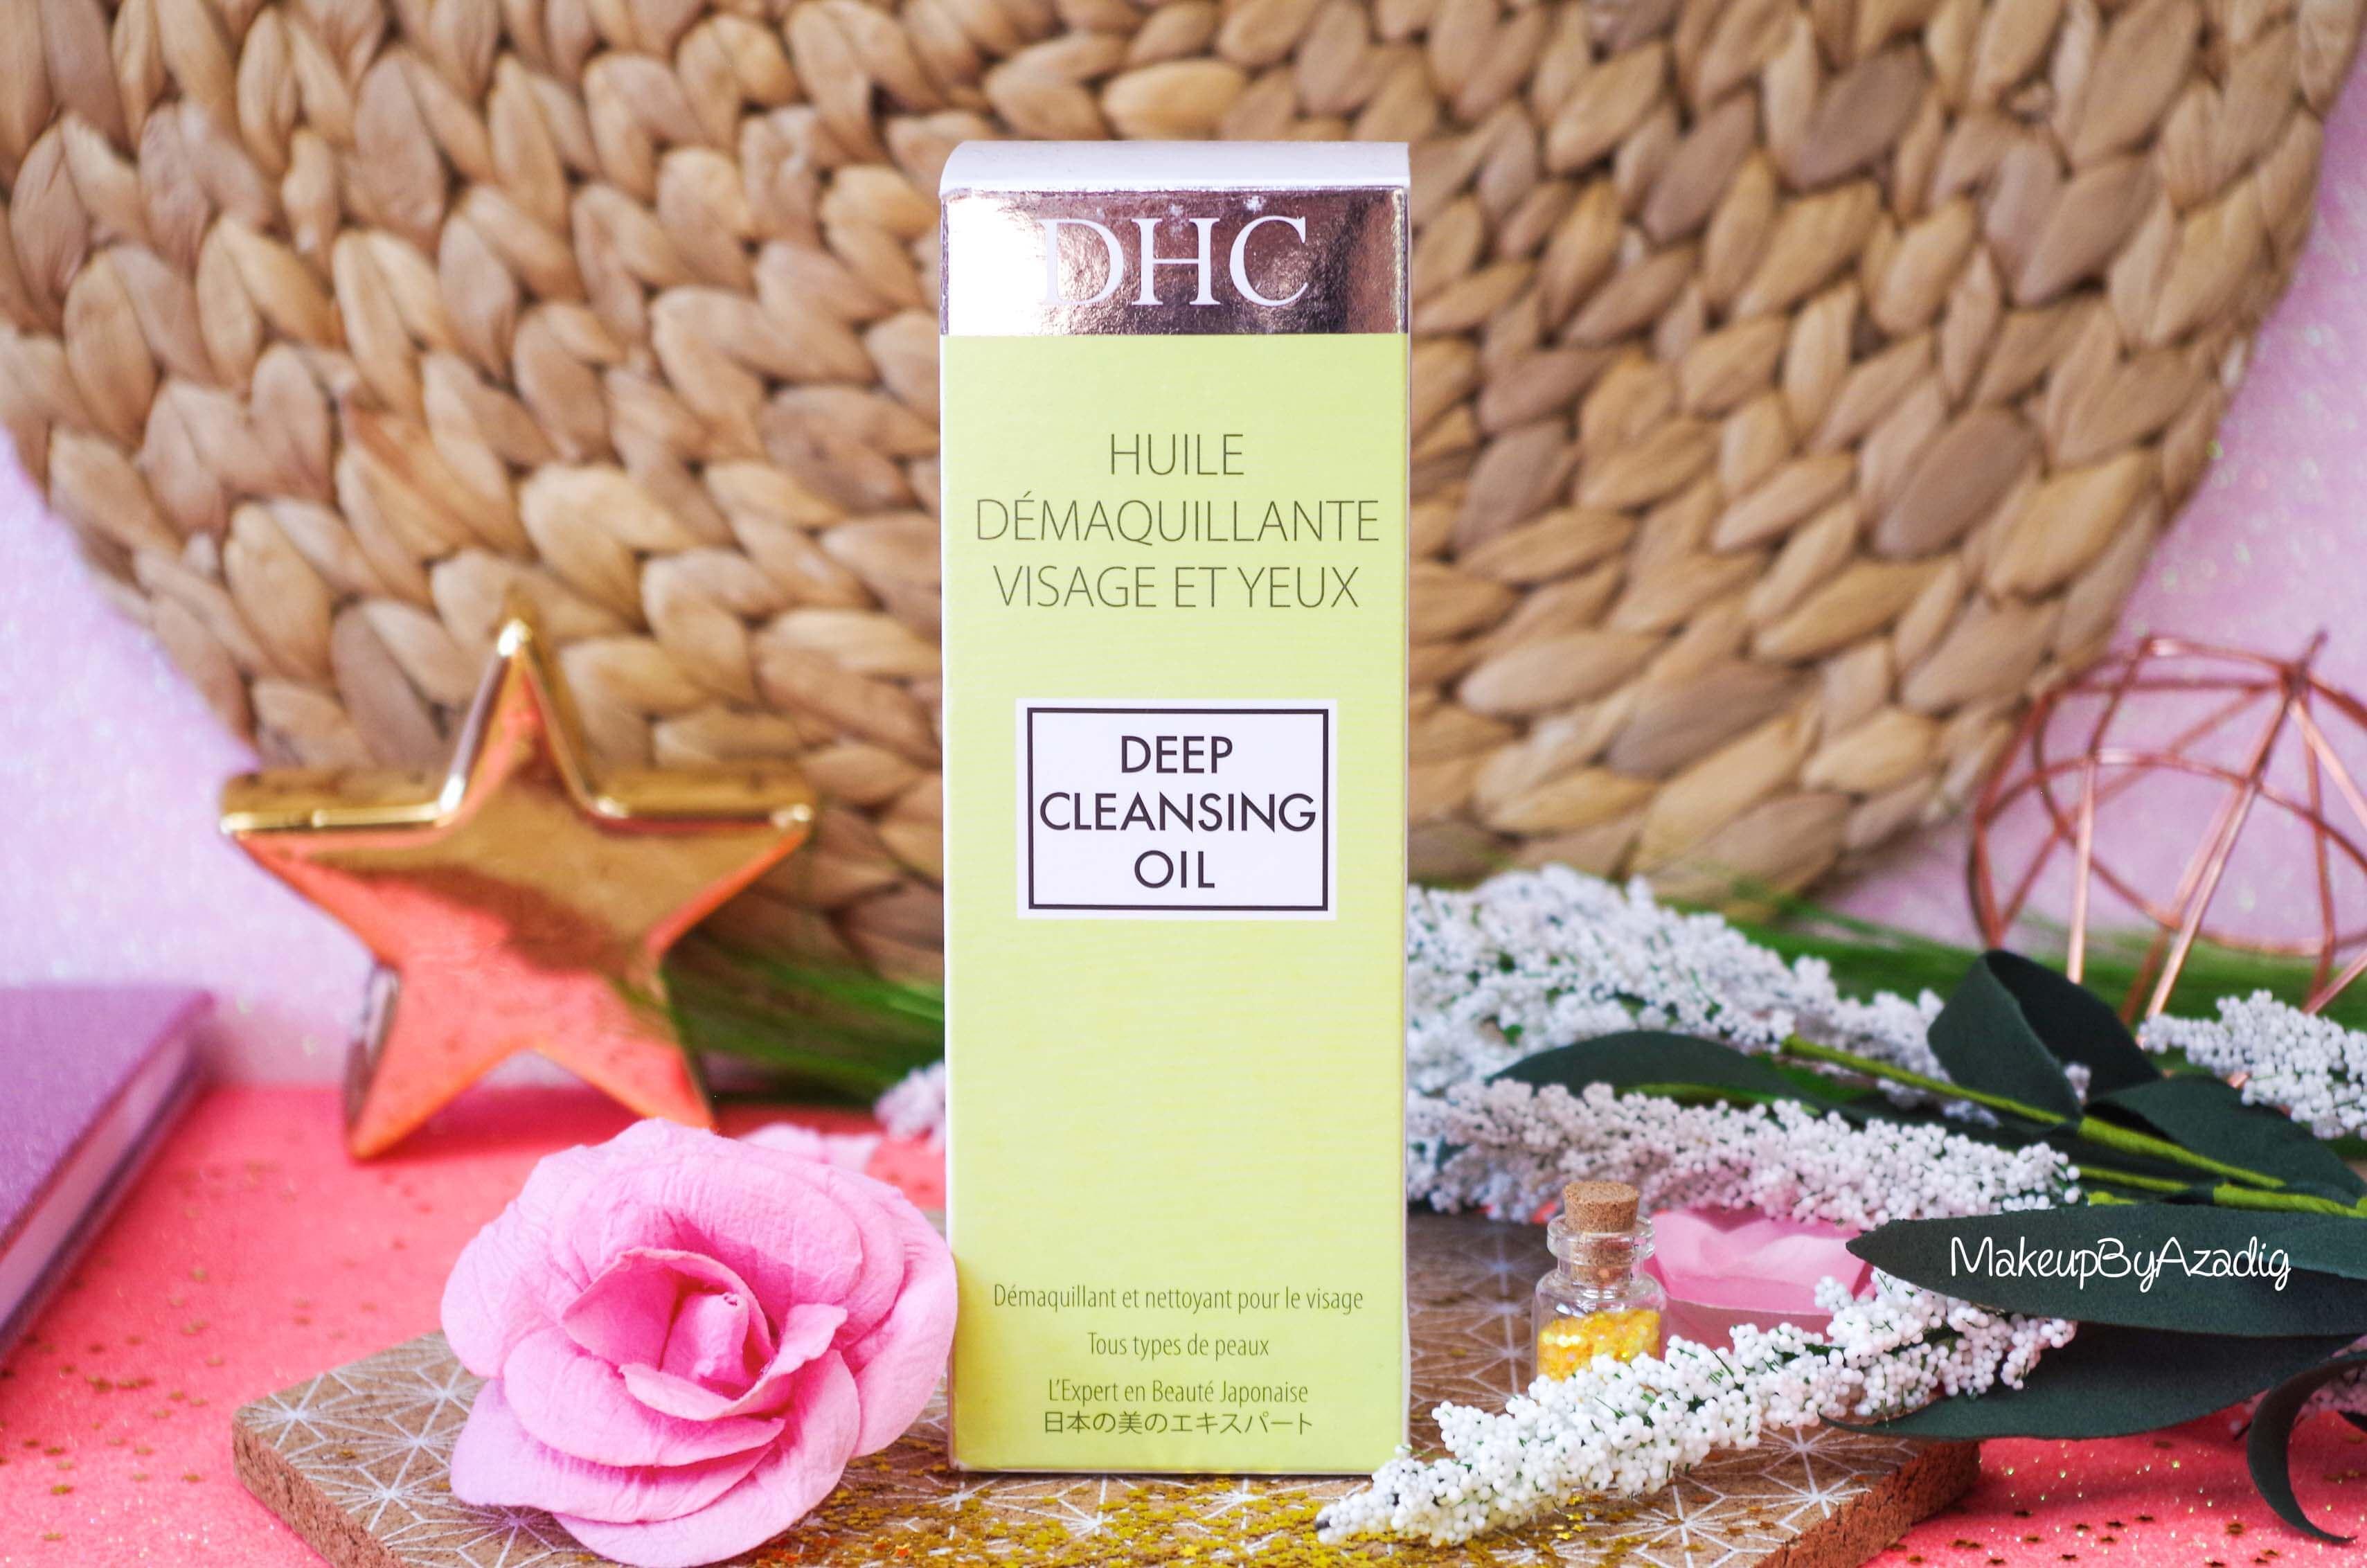 revue-review-huile-demaquillante-deep-cleansing-oil-dhc-meilleure-avis-prix-nocibe-monoprix-makeupbyazadig